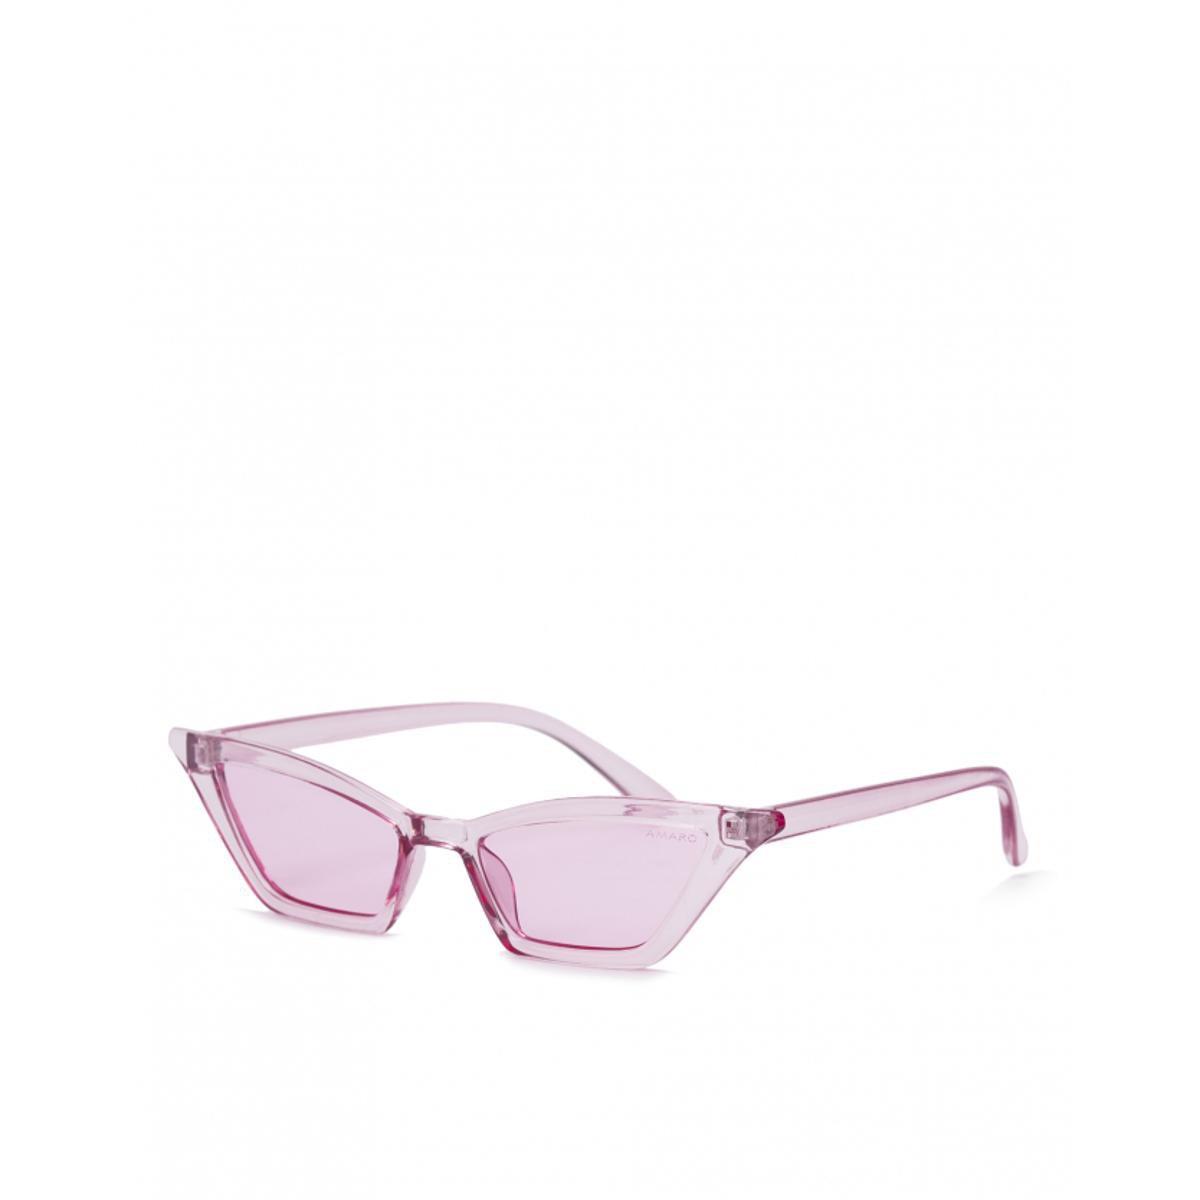 10285a482067b Óculos Amaro De Sol Cat Eye Geometric Feminino - Compre Agora   Zattini